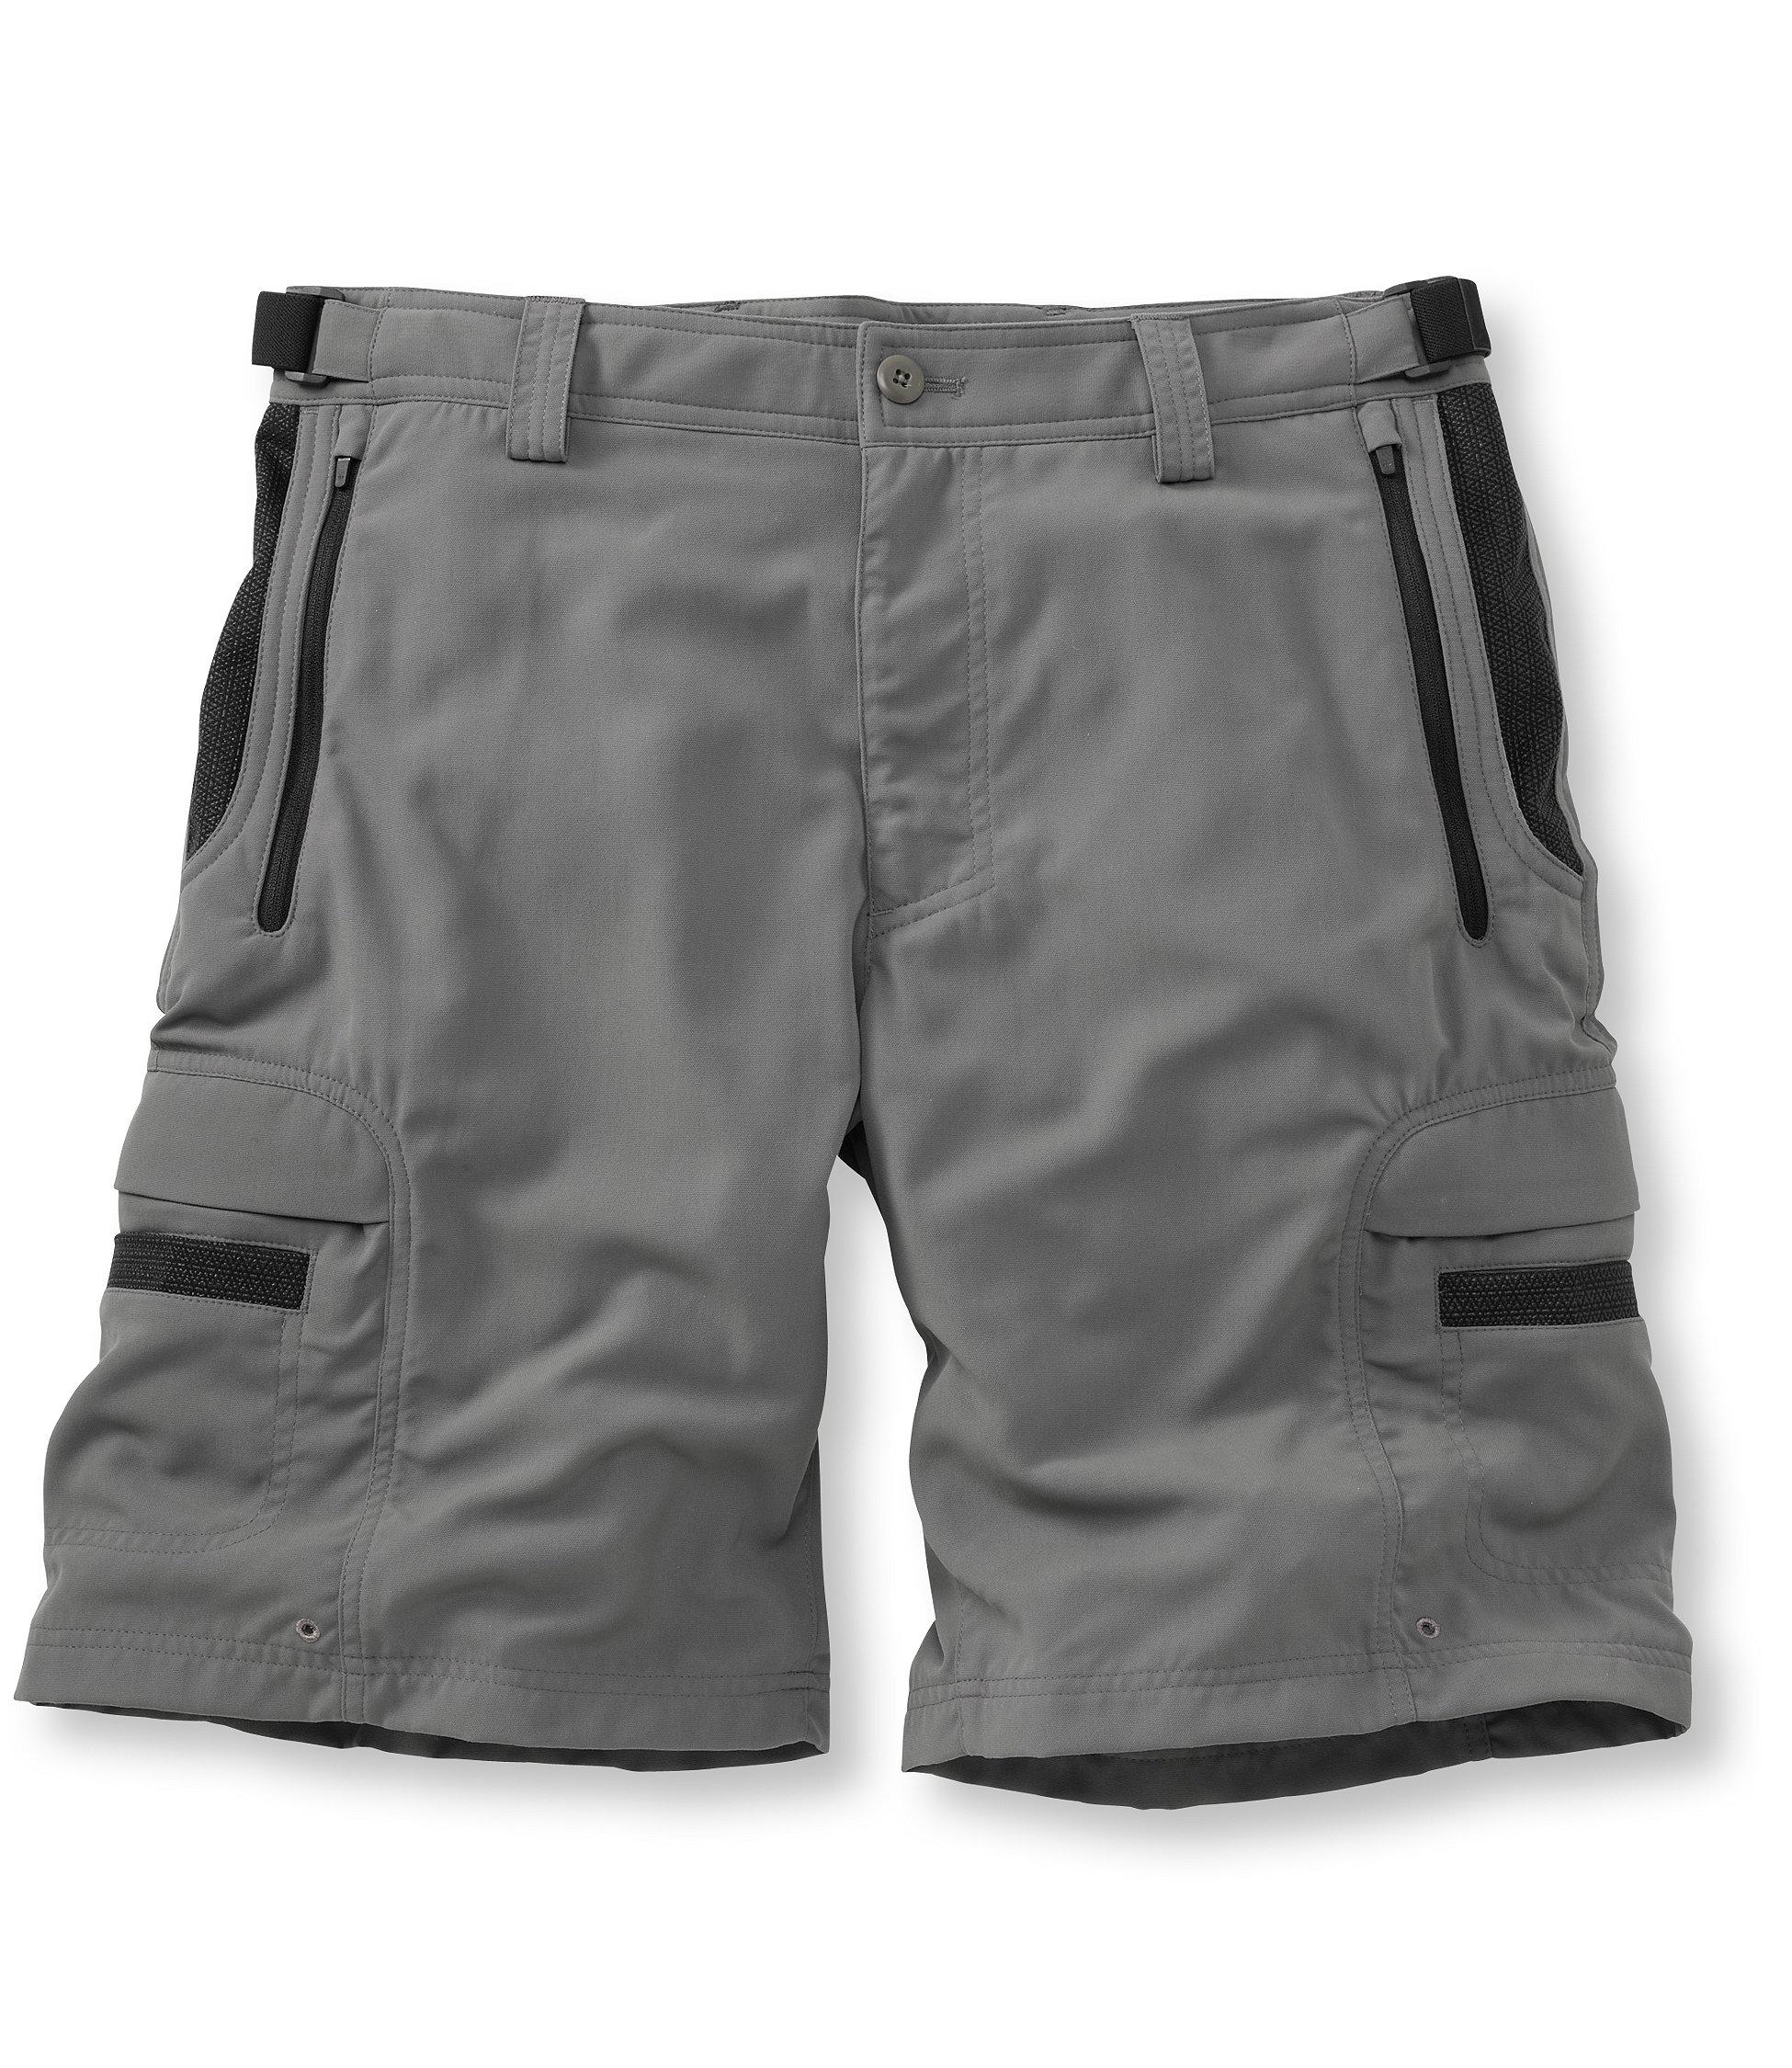 L.L.Bean Technical Fishing Shorts